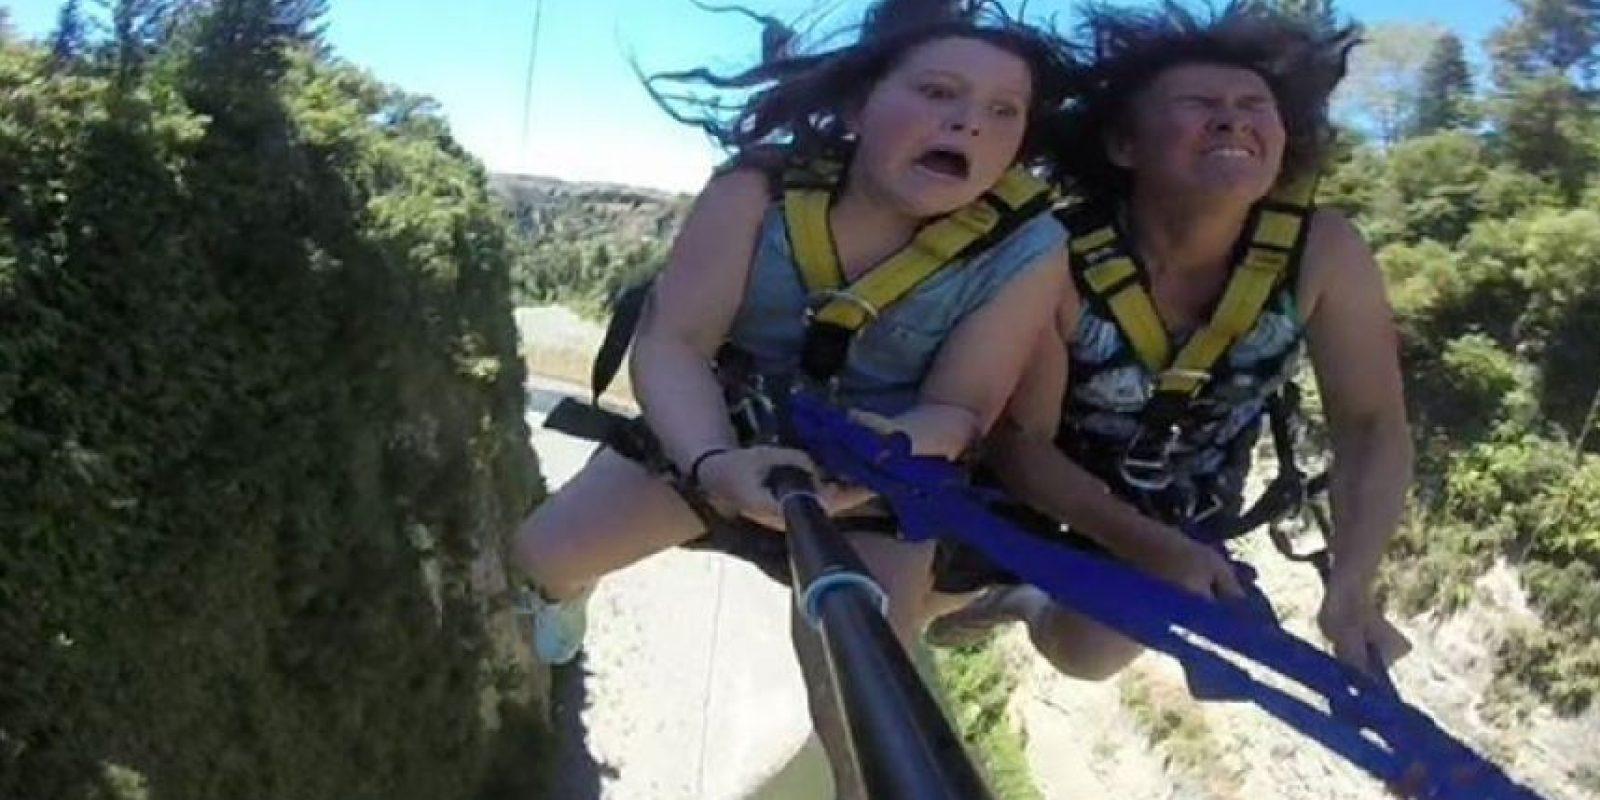 Gravity Canyon en Nueva Zelanda Foto:Facebook.com/gravitycanyonnz